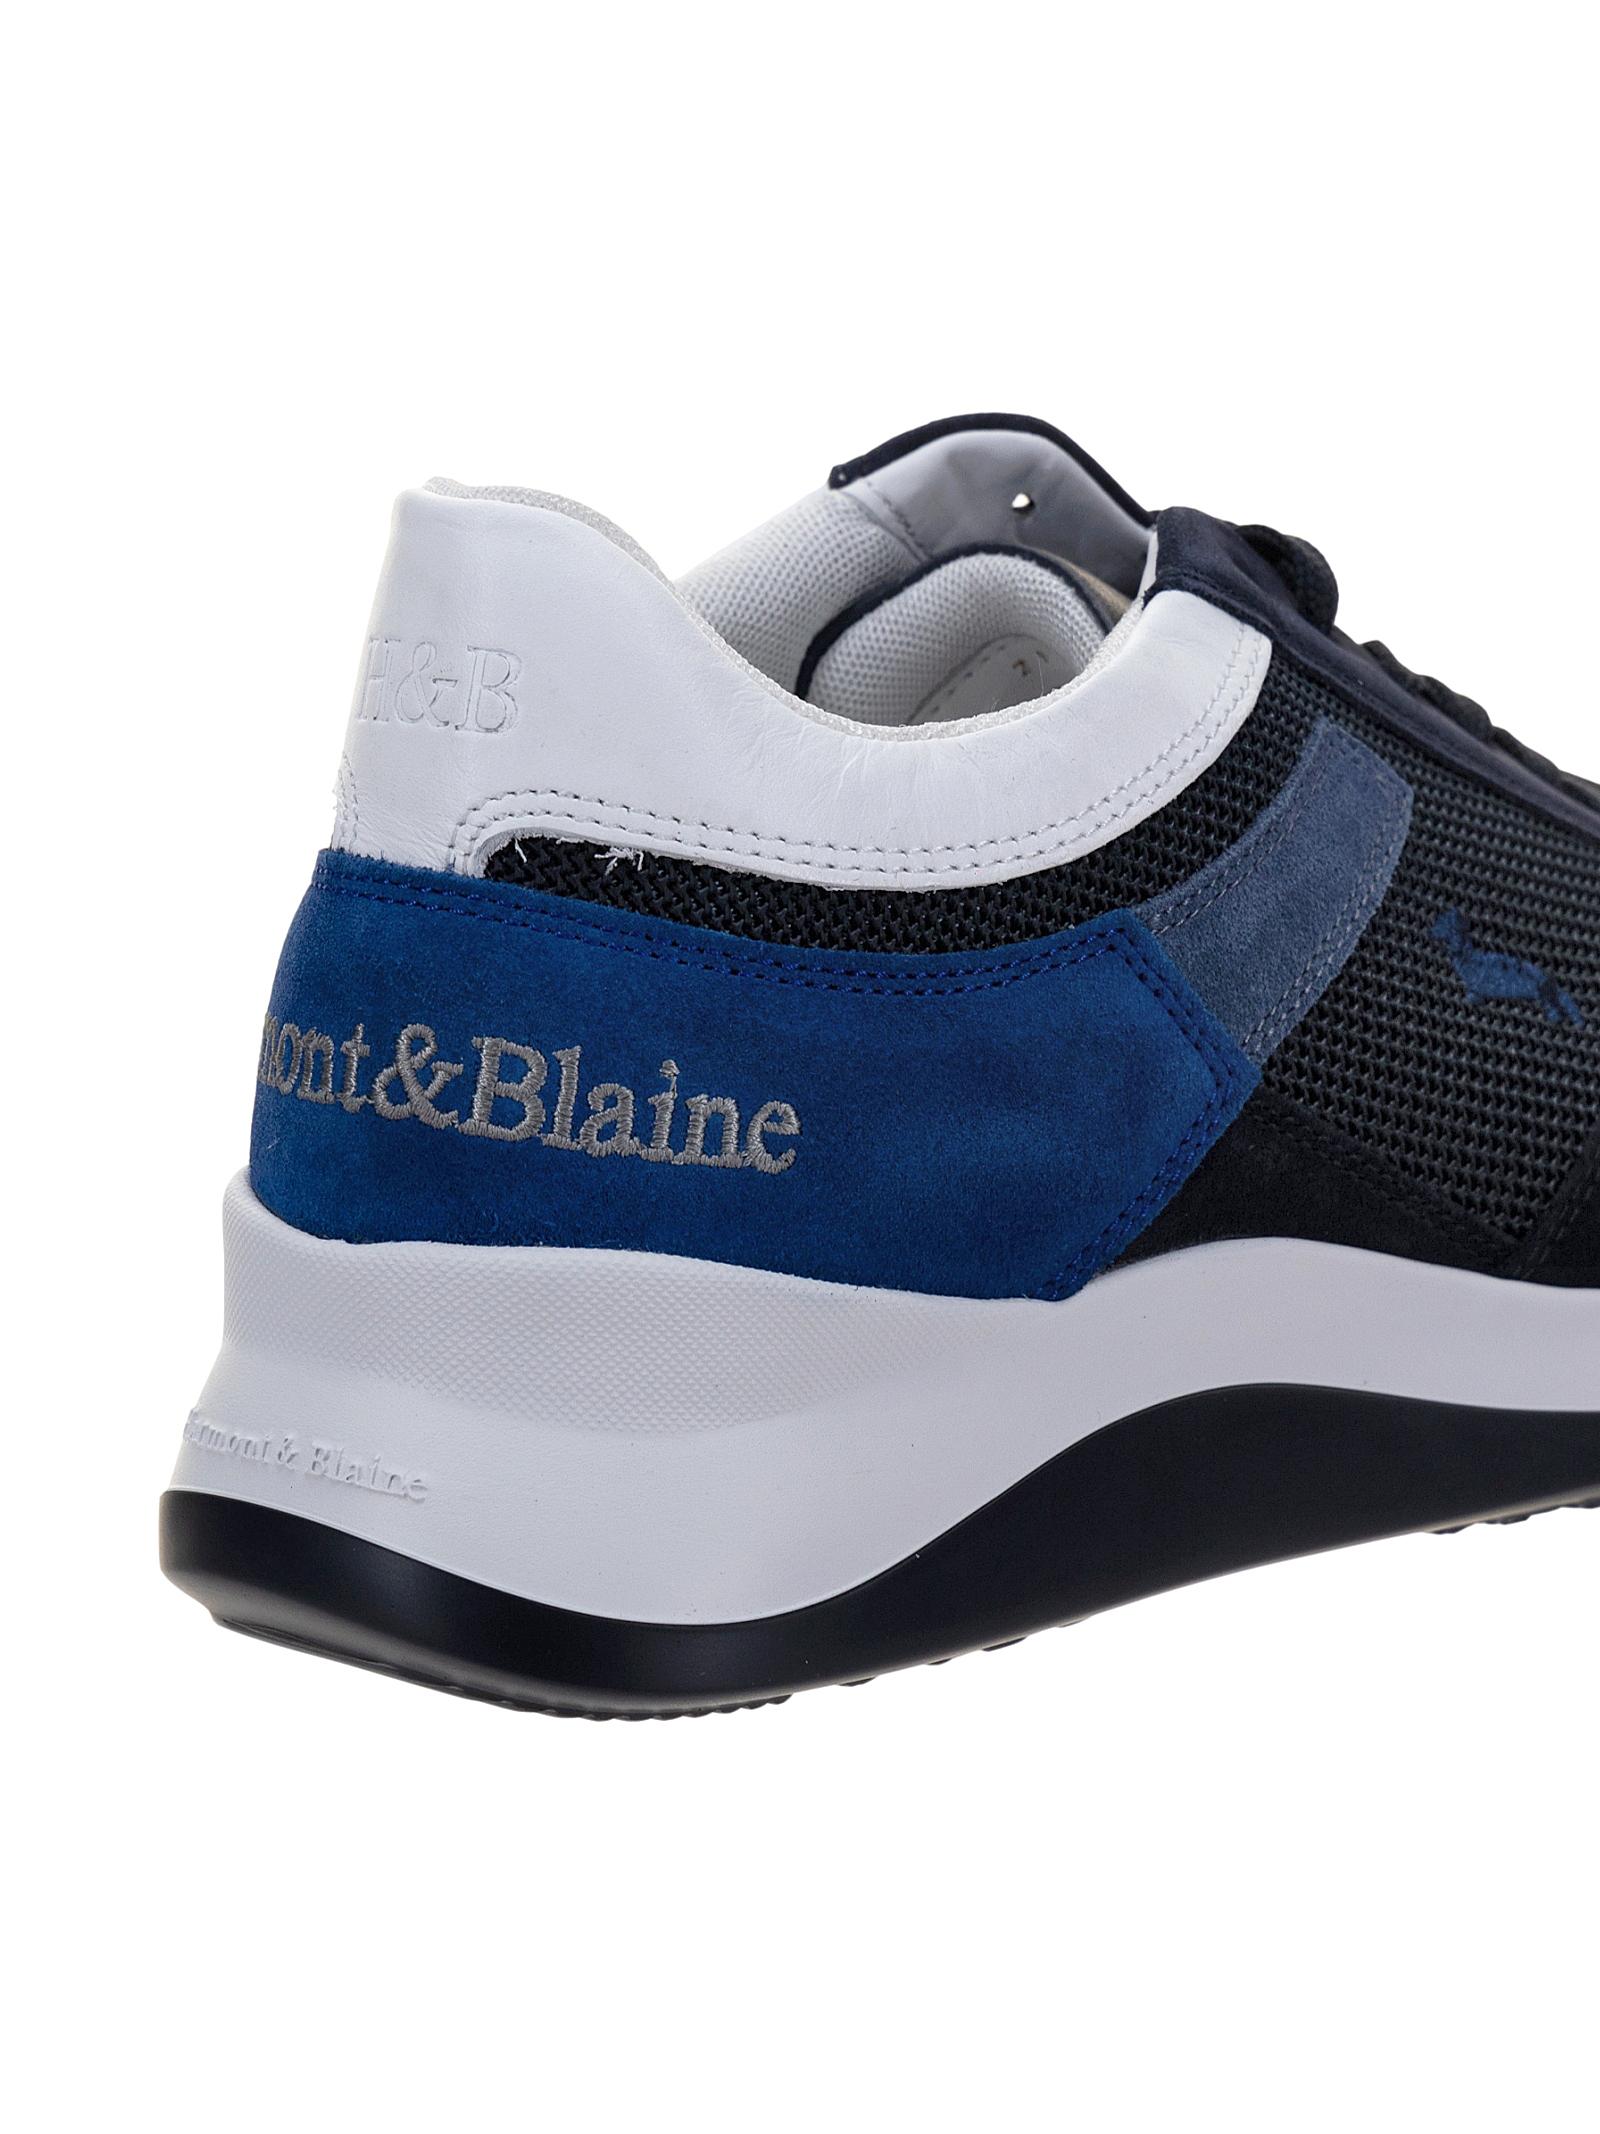 Harmont & Blaine Scarpe EFM211 060 6120